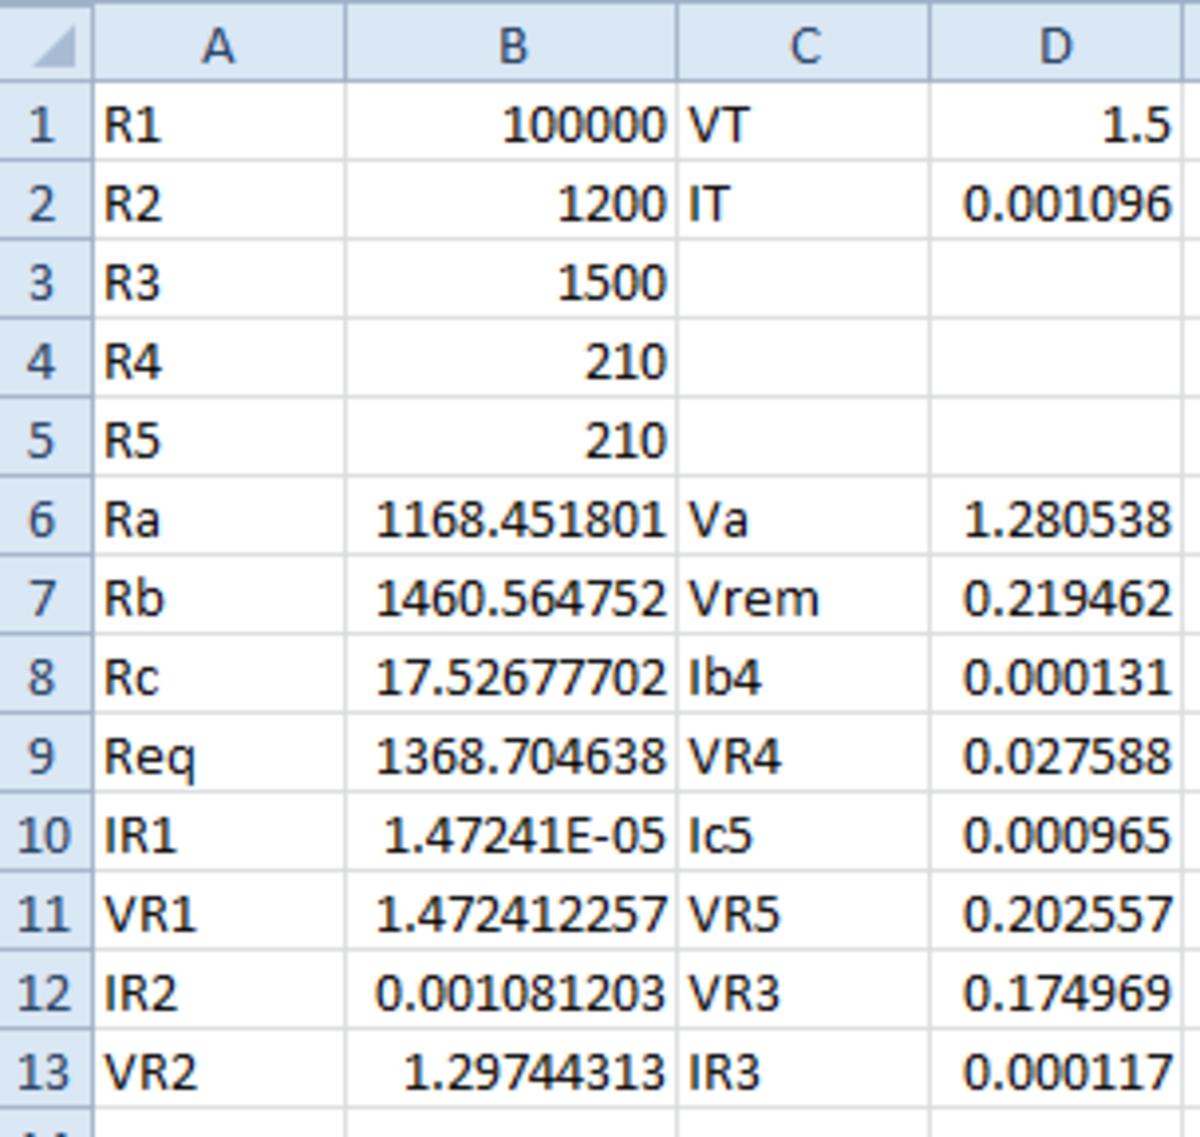 The final spreadsheet.